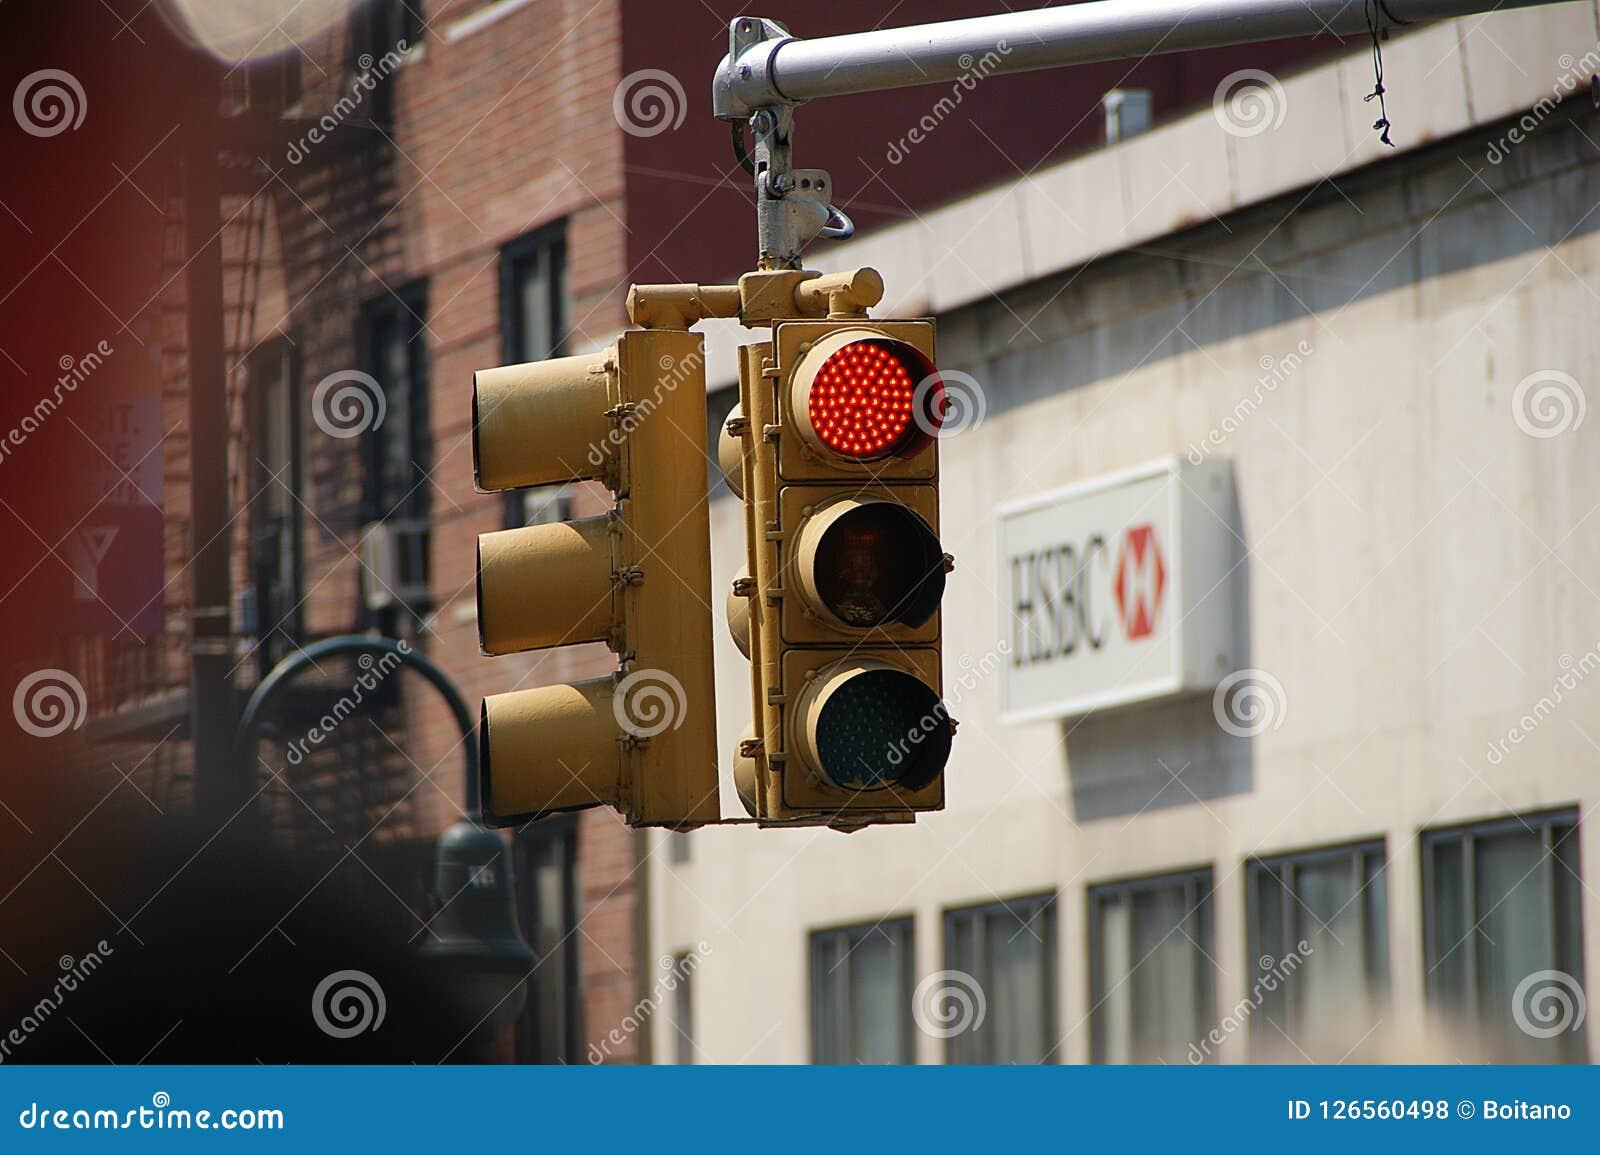 Manhattan, New York City, New York - June 10 2009  Red Color Traffic